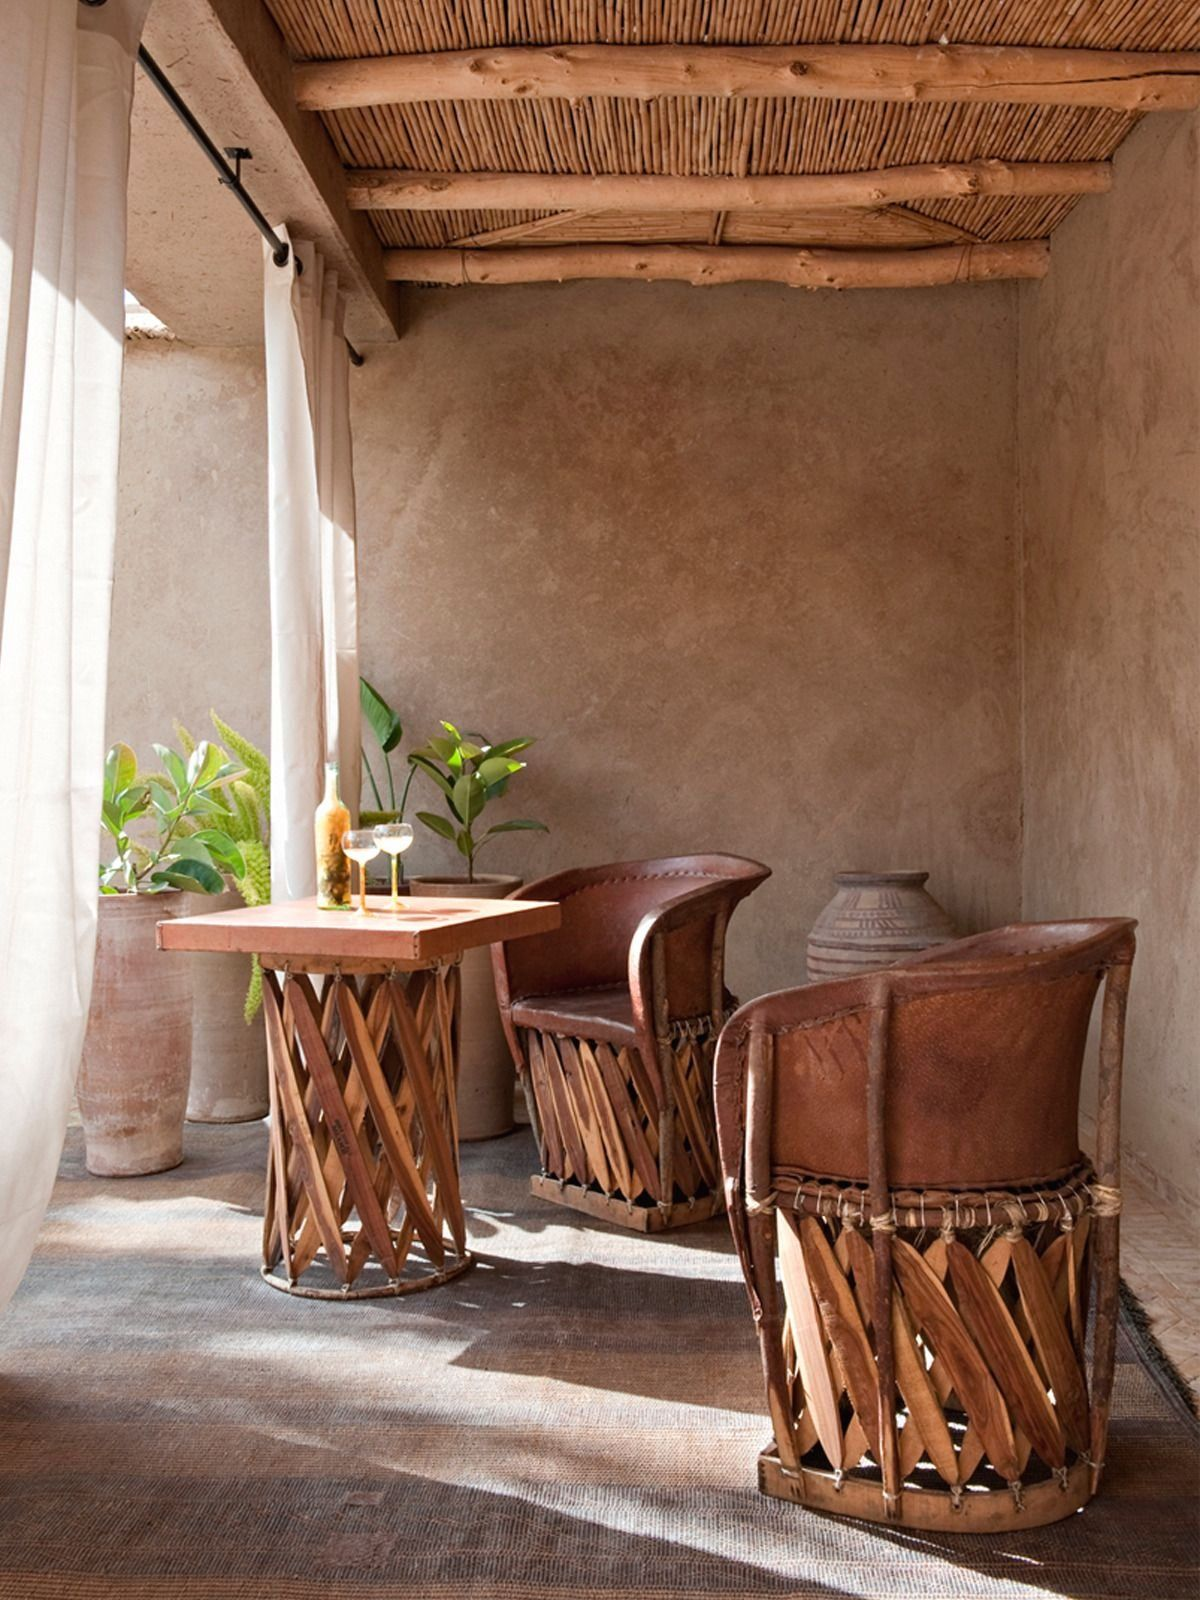 sabonhomeblog   1000 in 2020   Outdoor decor backyard ... on Mexican Backyard Decor id=86050